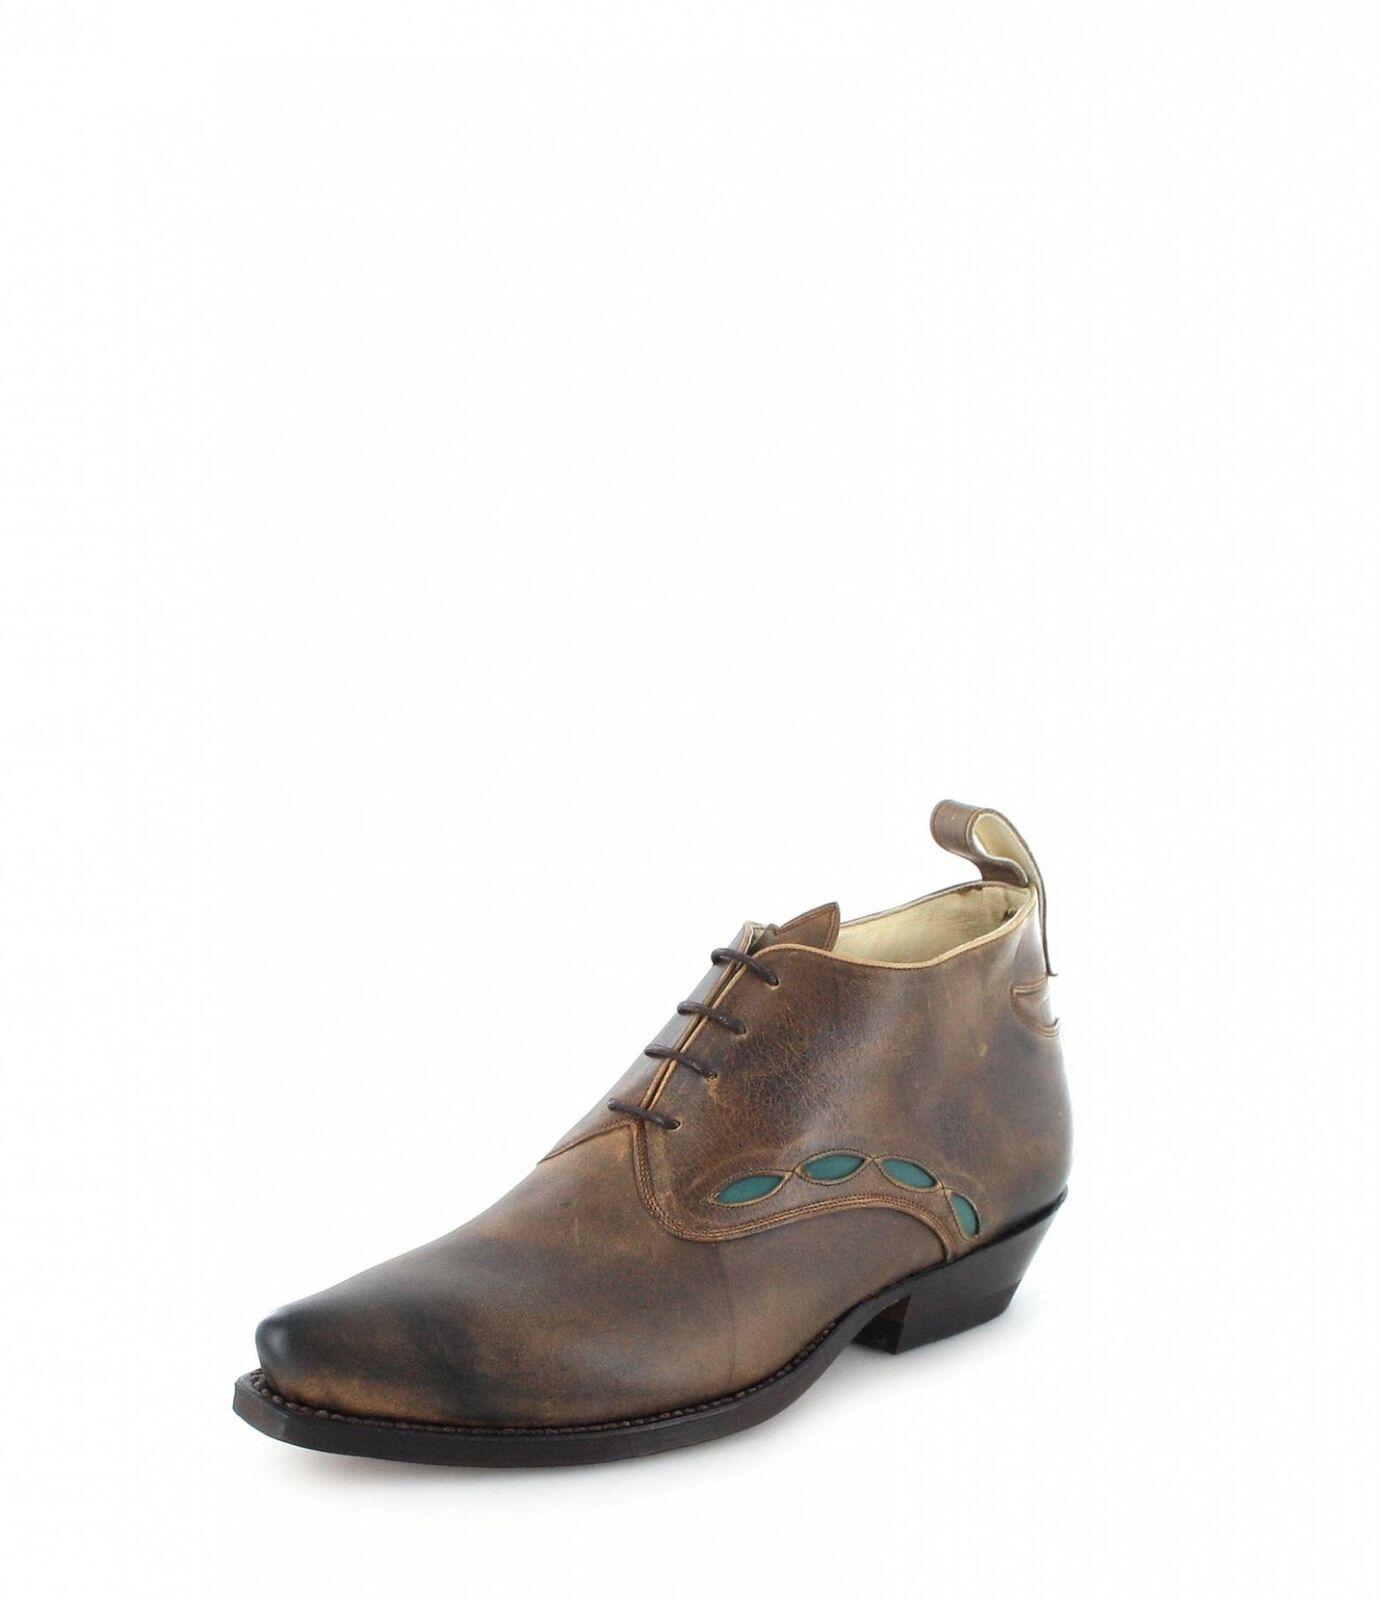 Mulet by Tony mora Stivali zapato Marroneee Western Scarpe